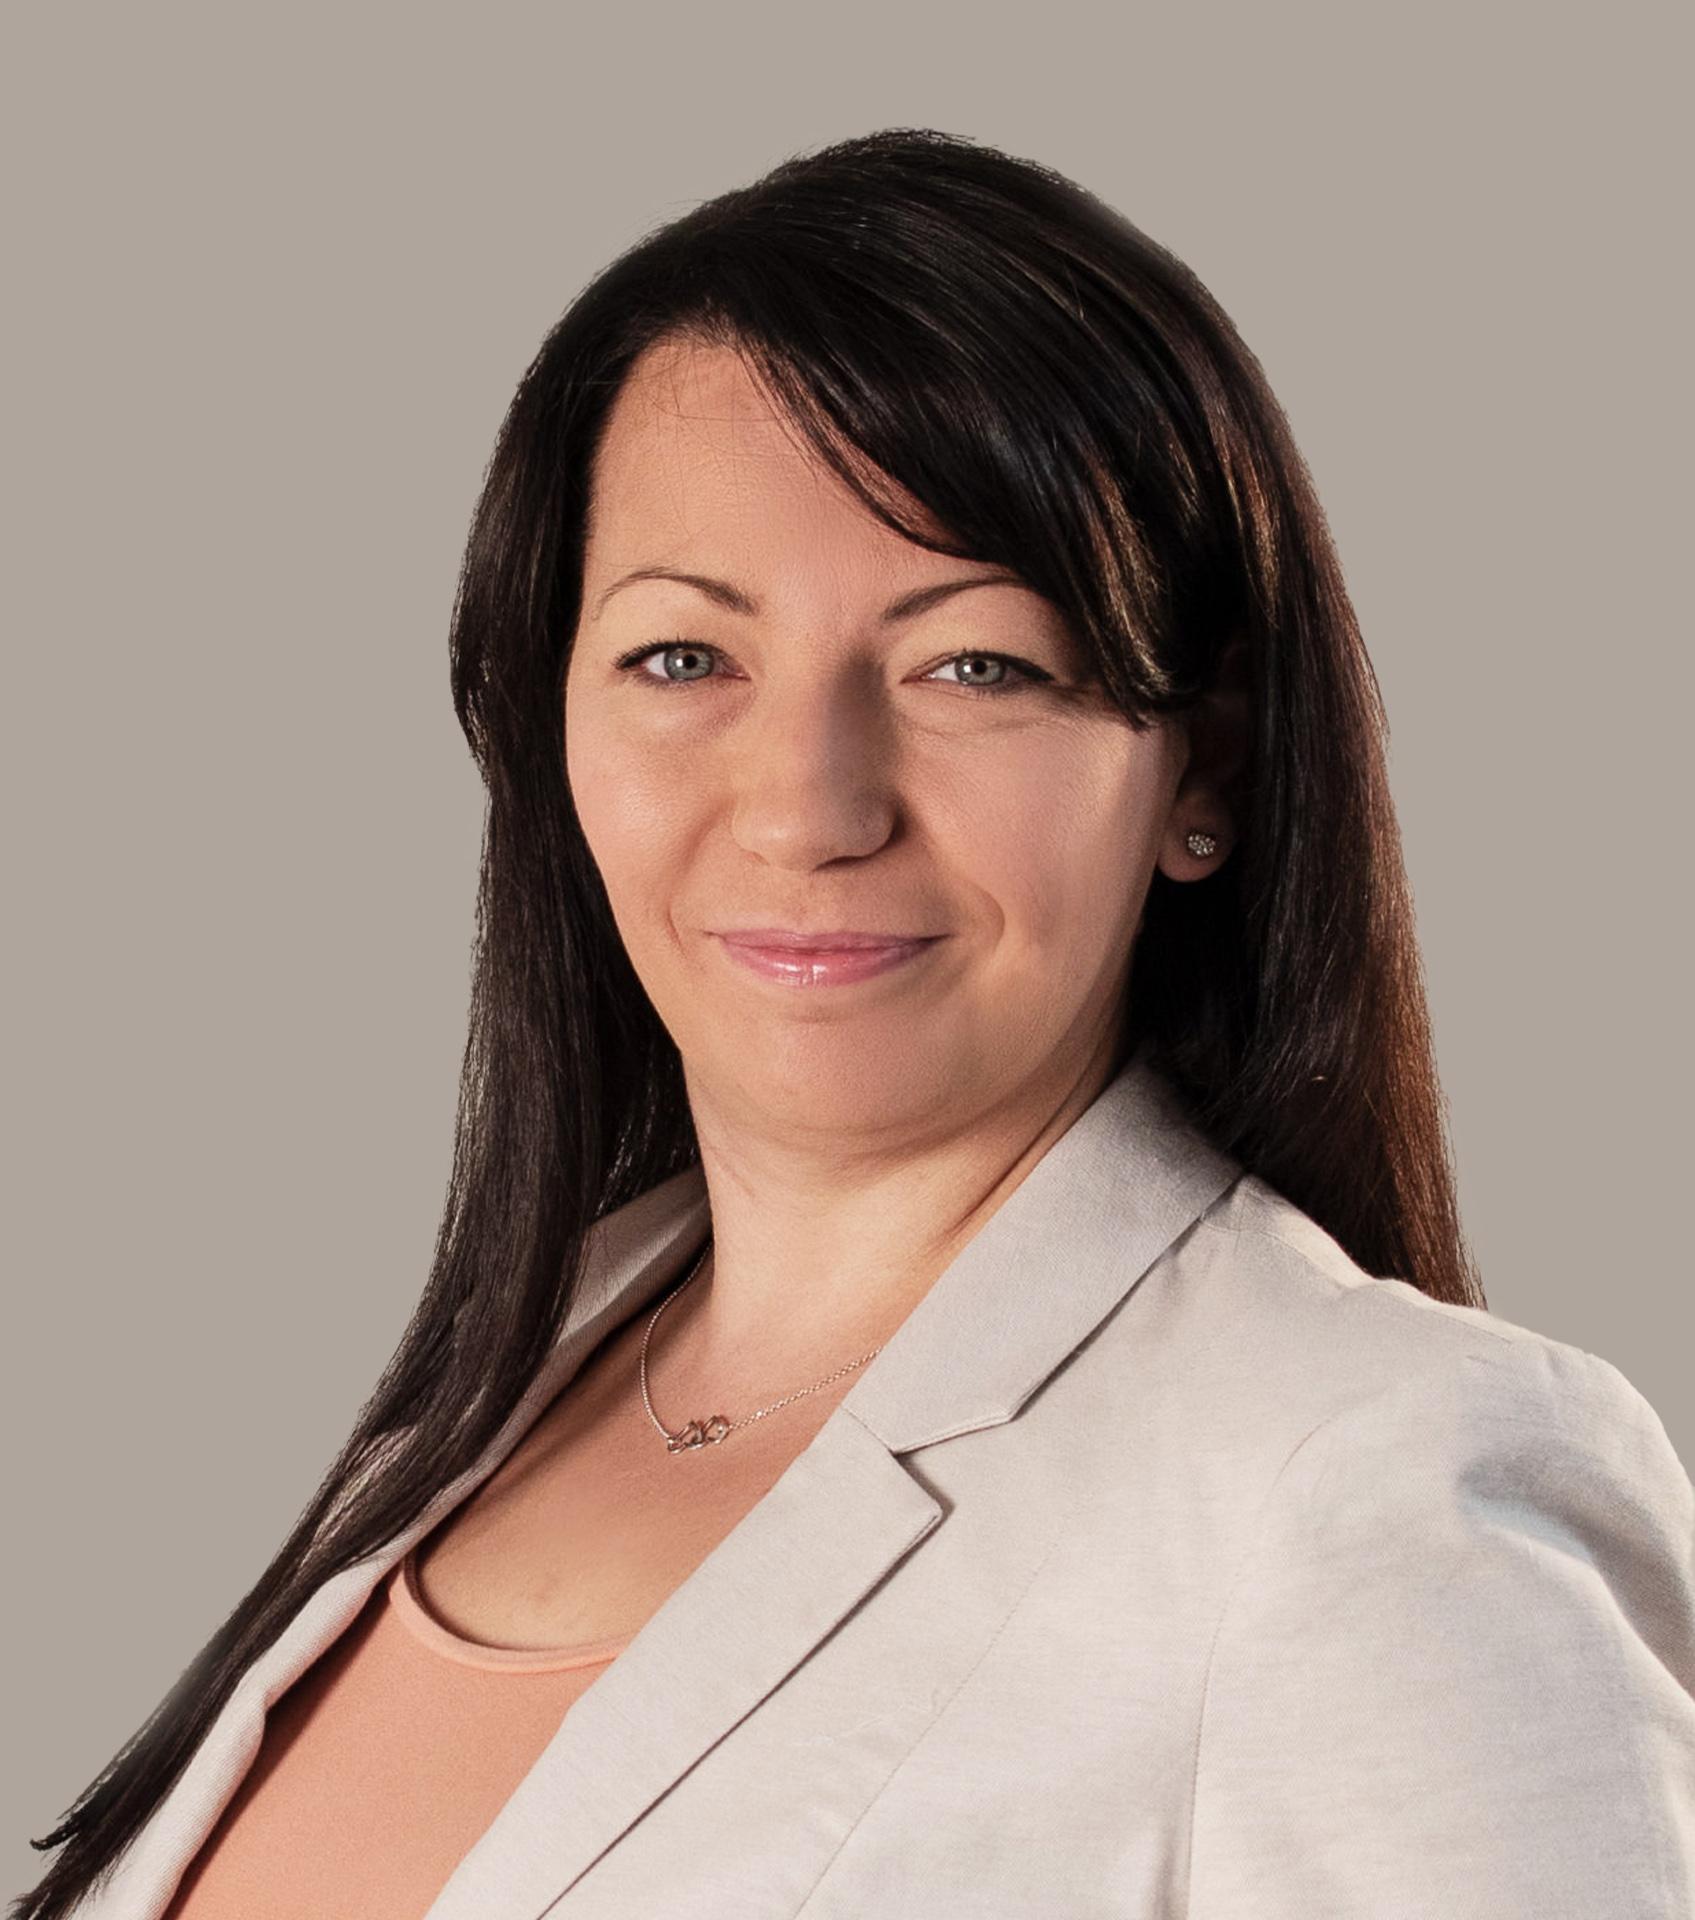 Agnieszka Mąkosa